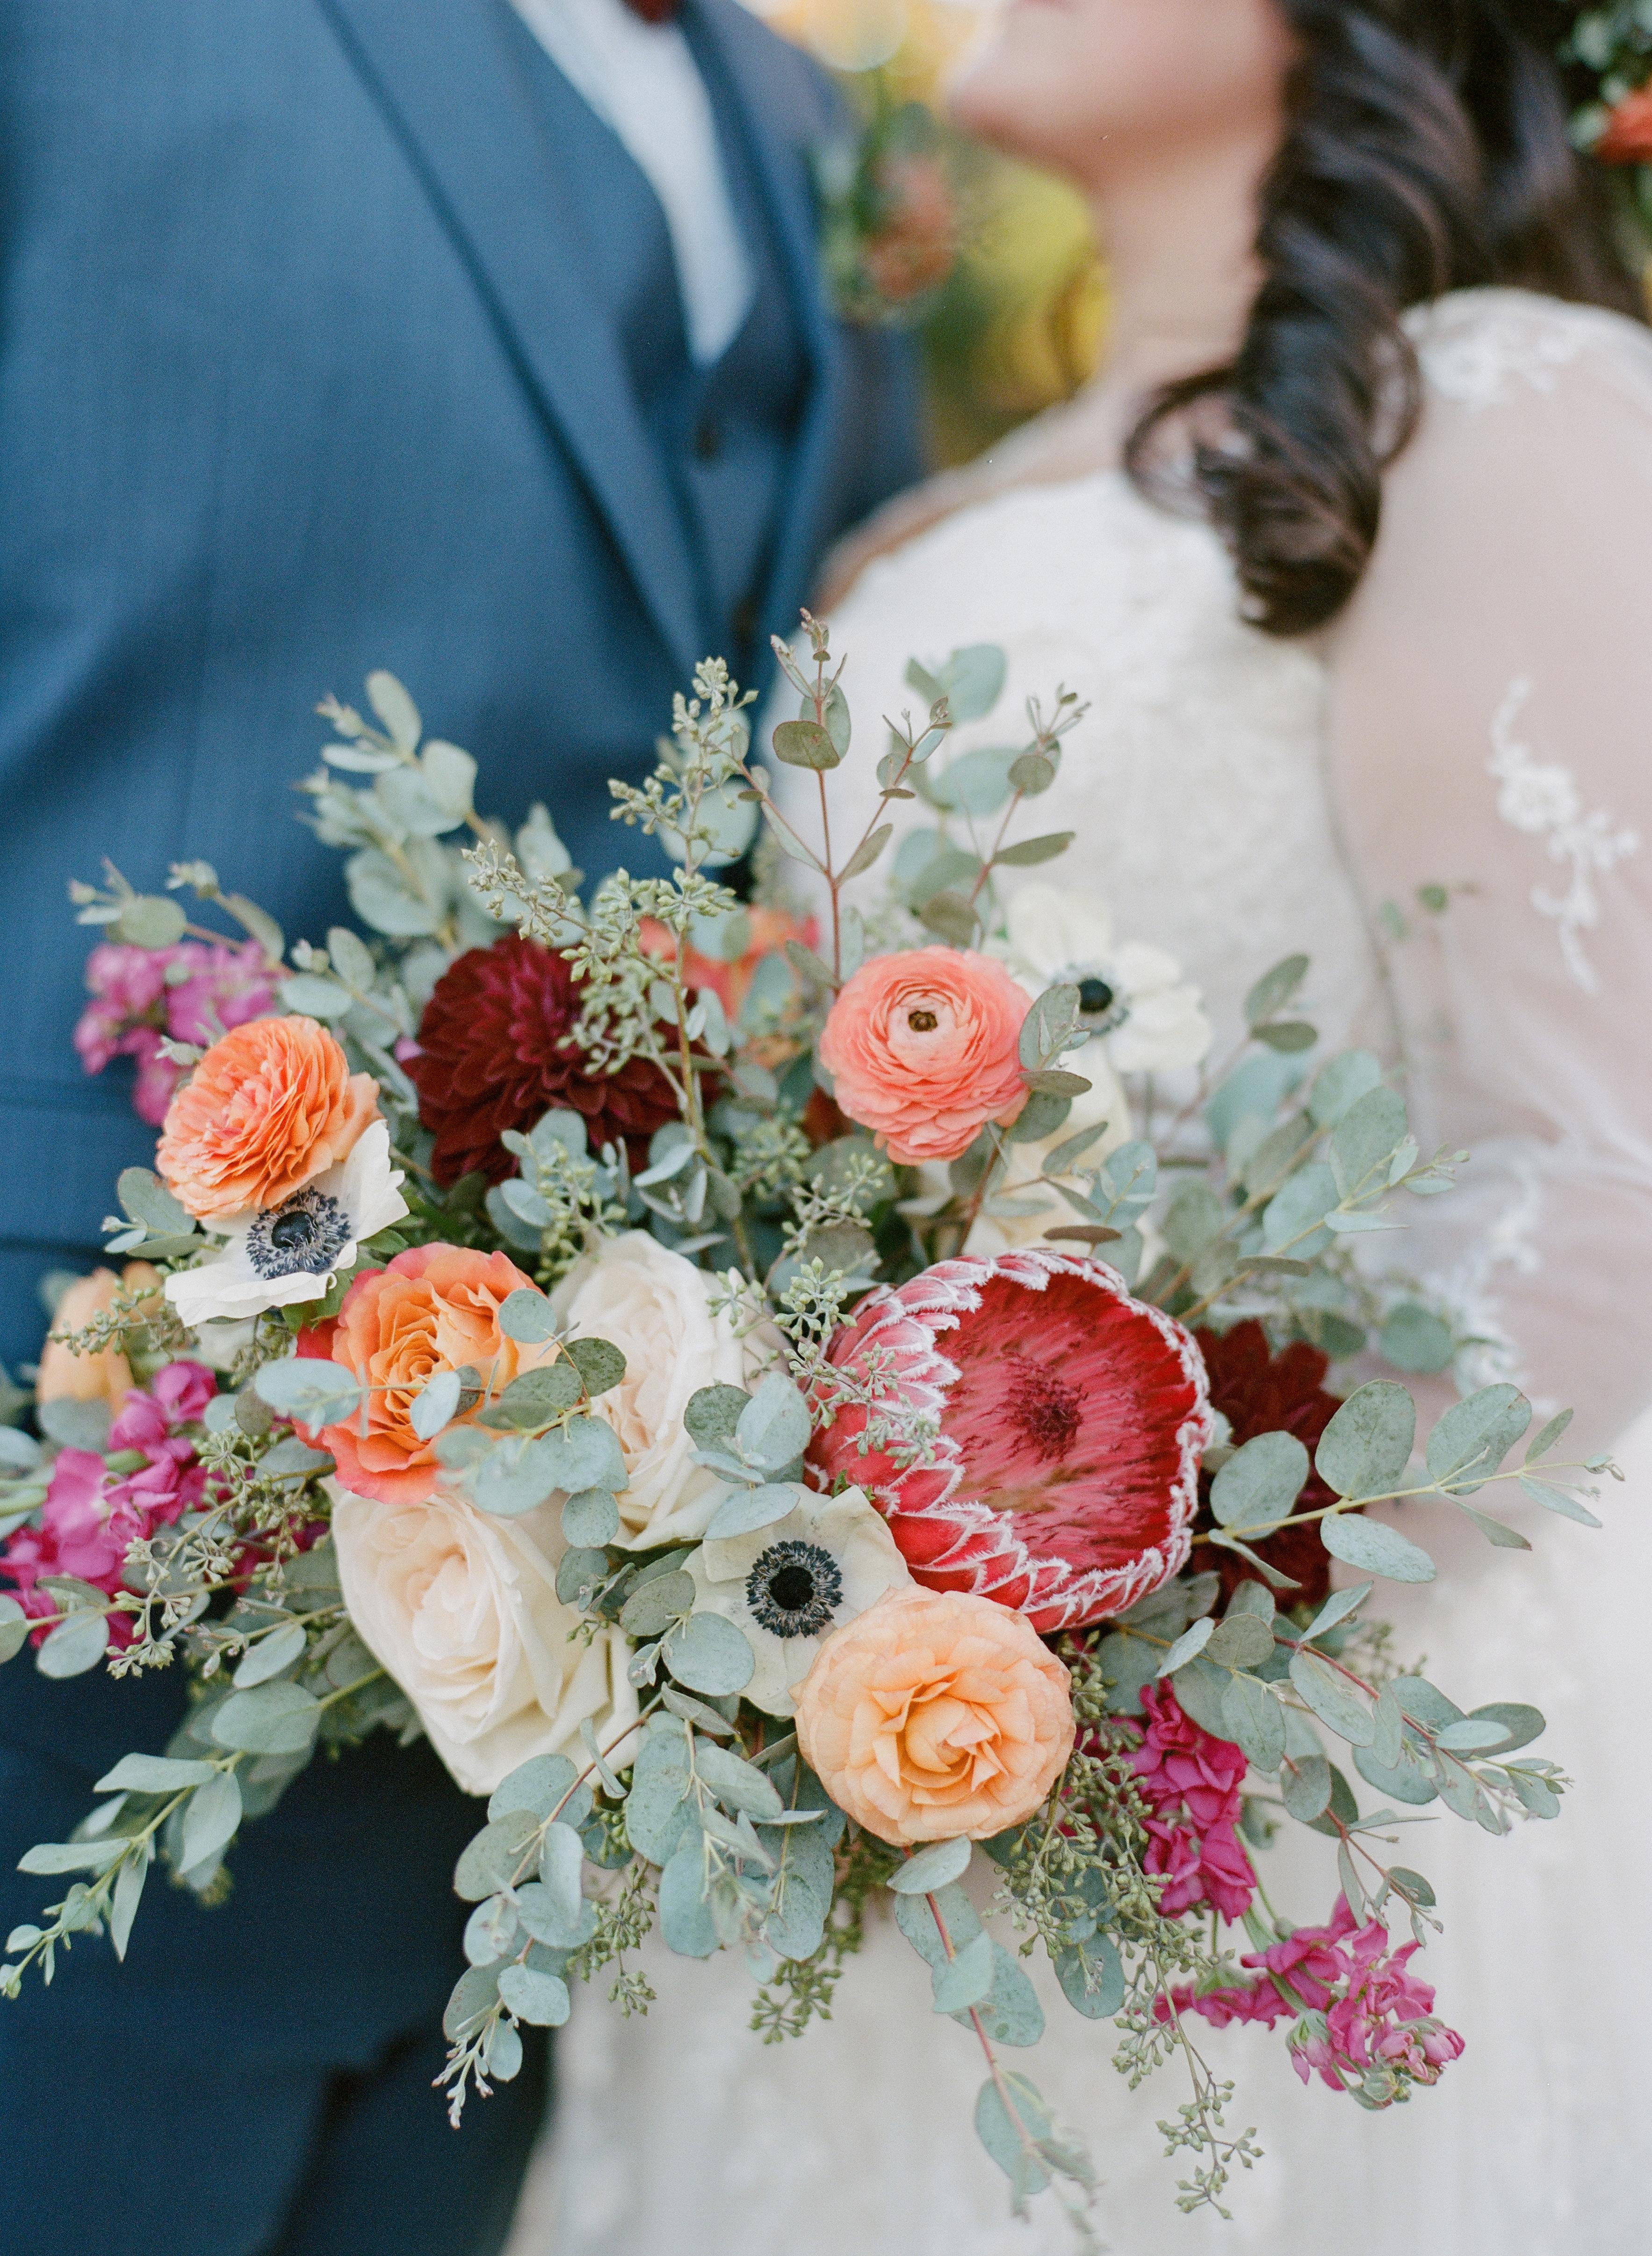 Private-Home-Rental-Wedding-VRBO-Fall-Breckenridge-Colorado-Bride-Bouquet-Details